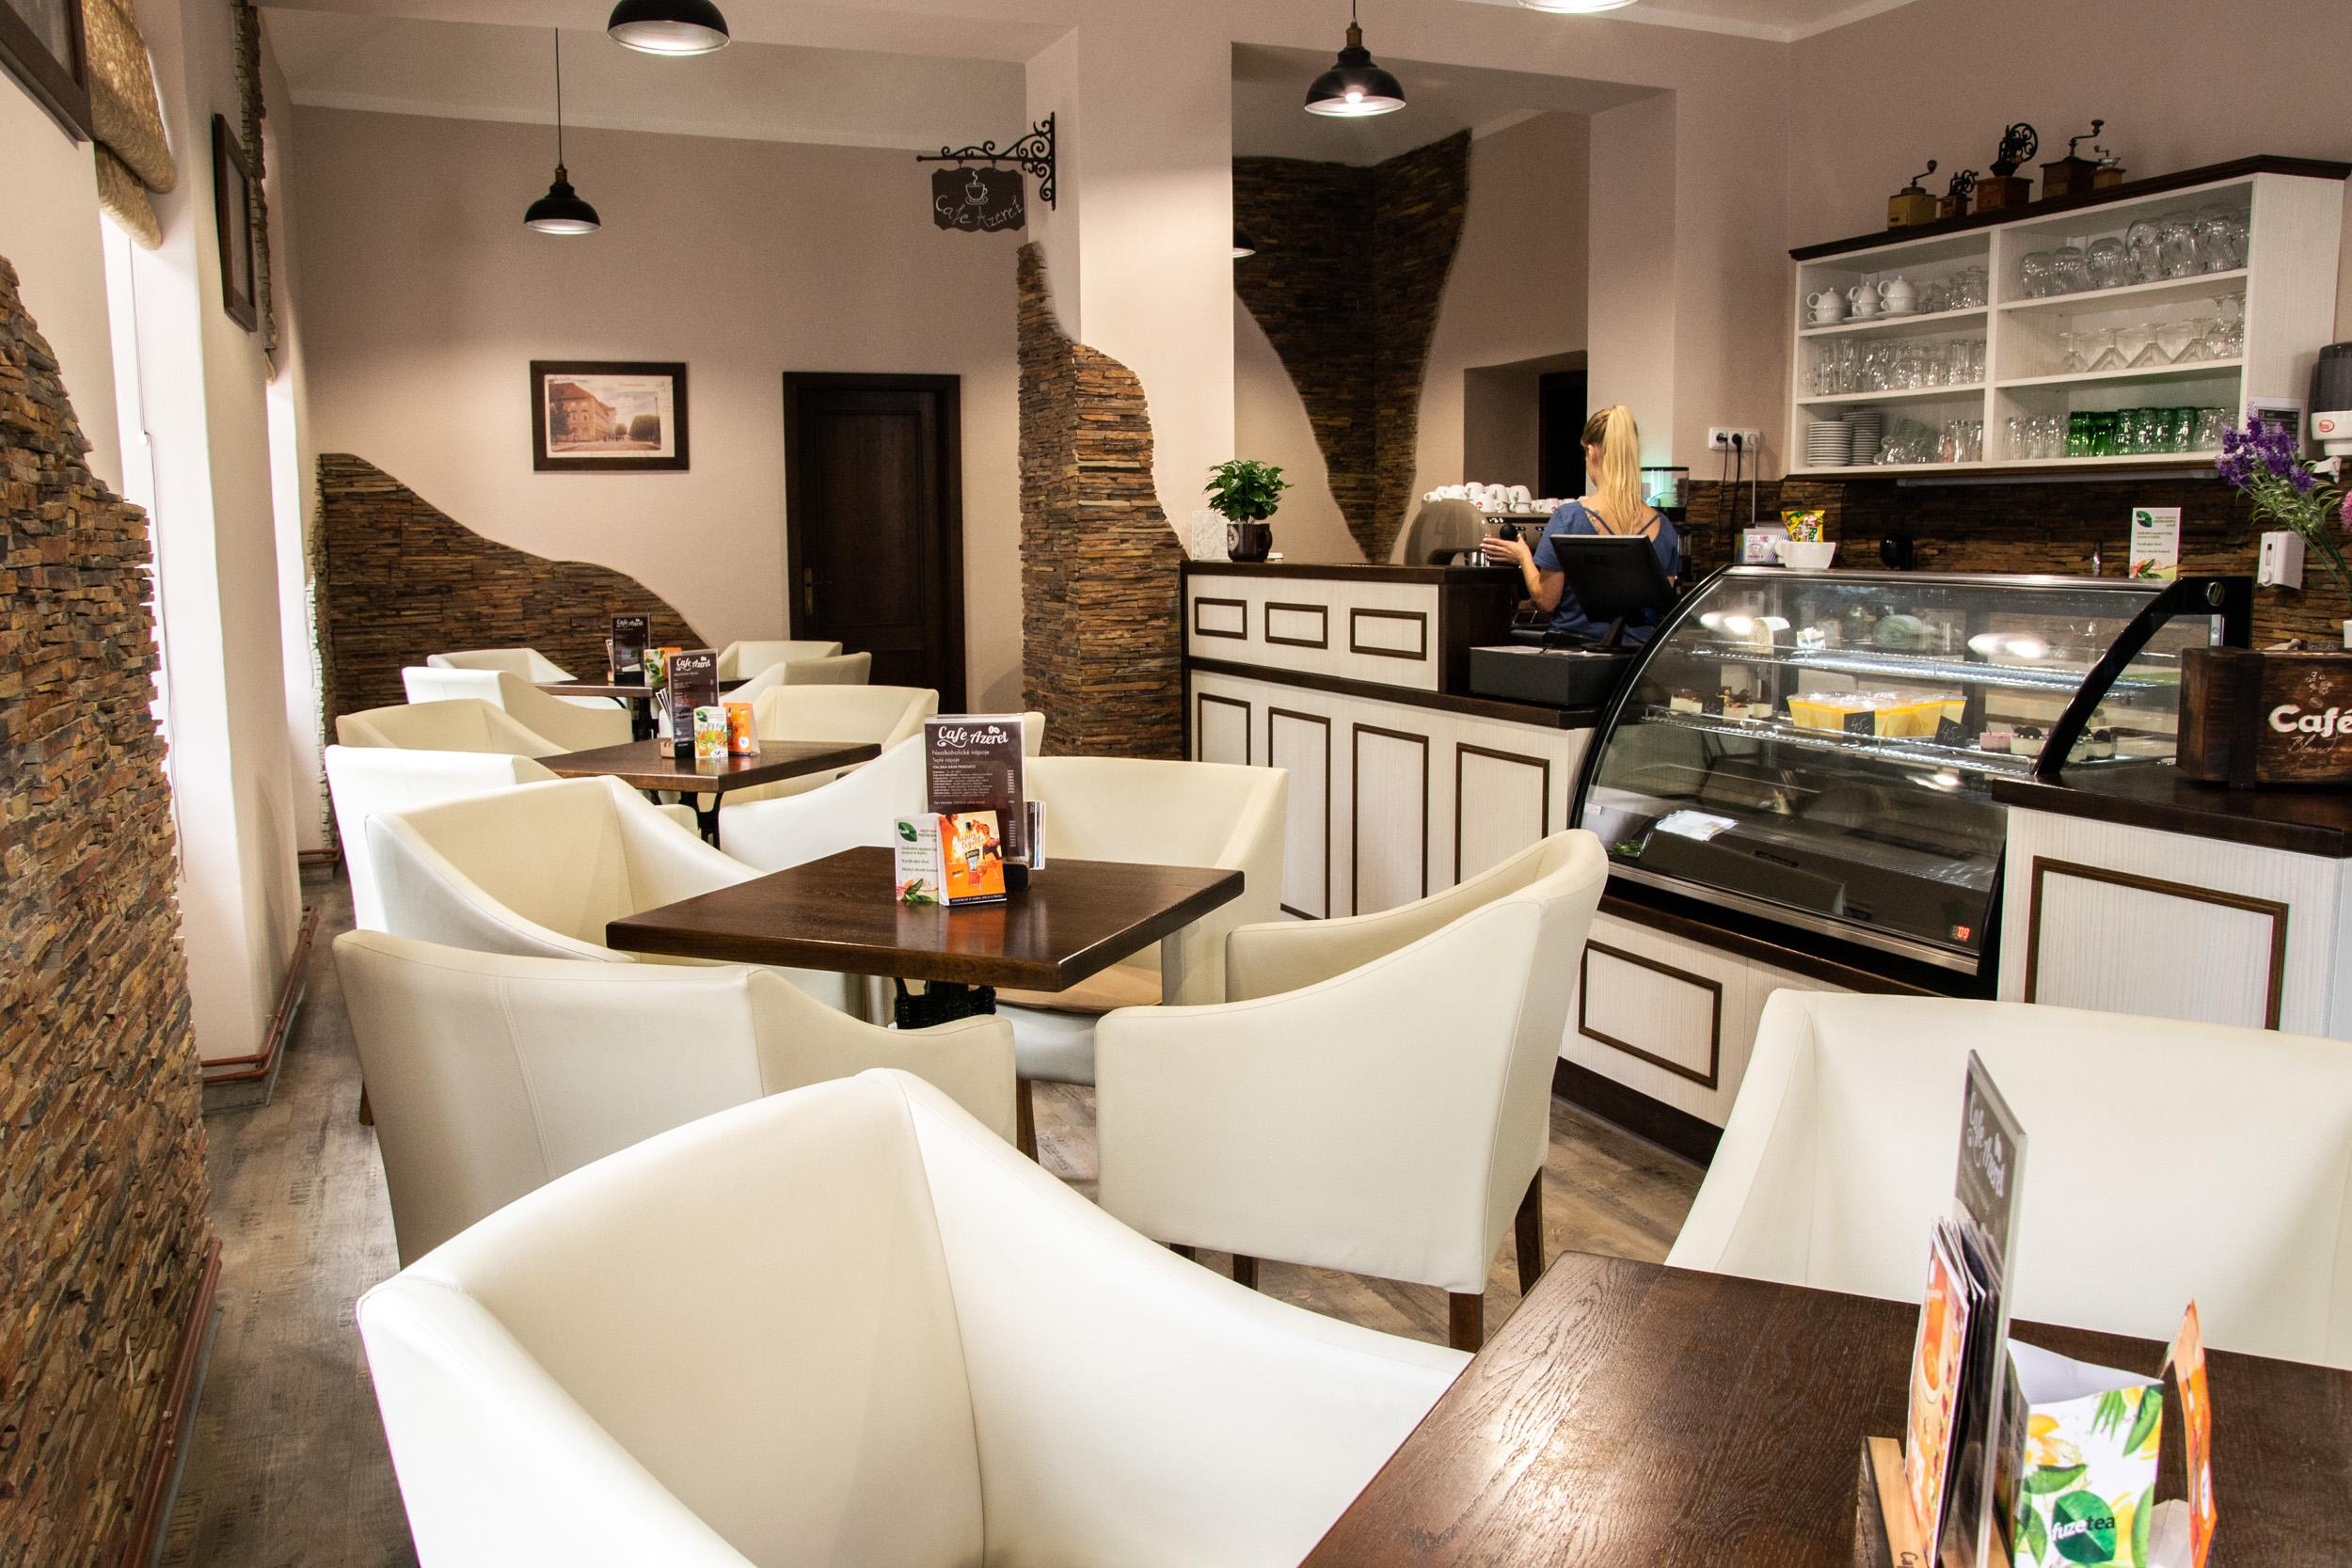 Cafe Azeret, Terezín